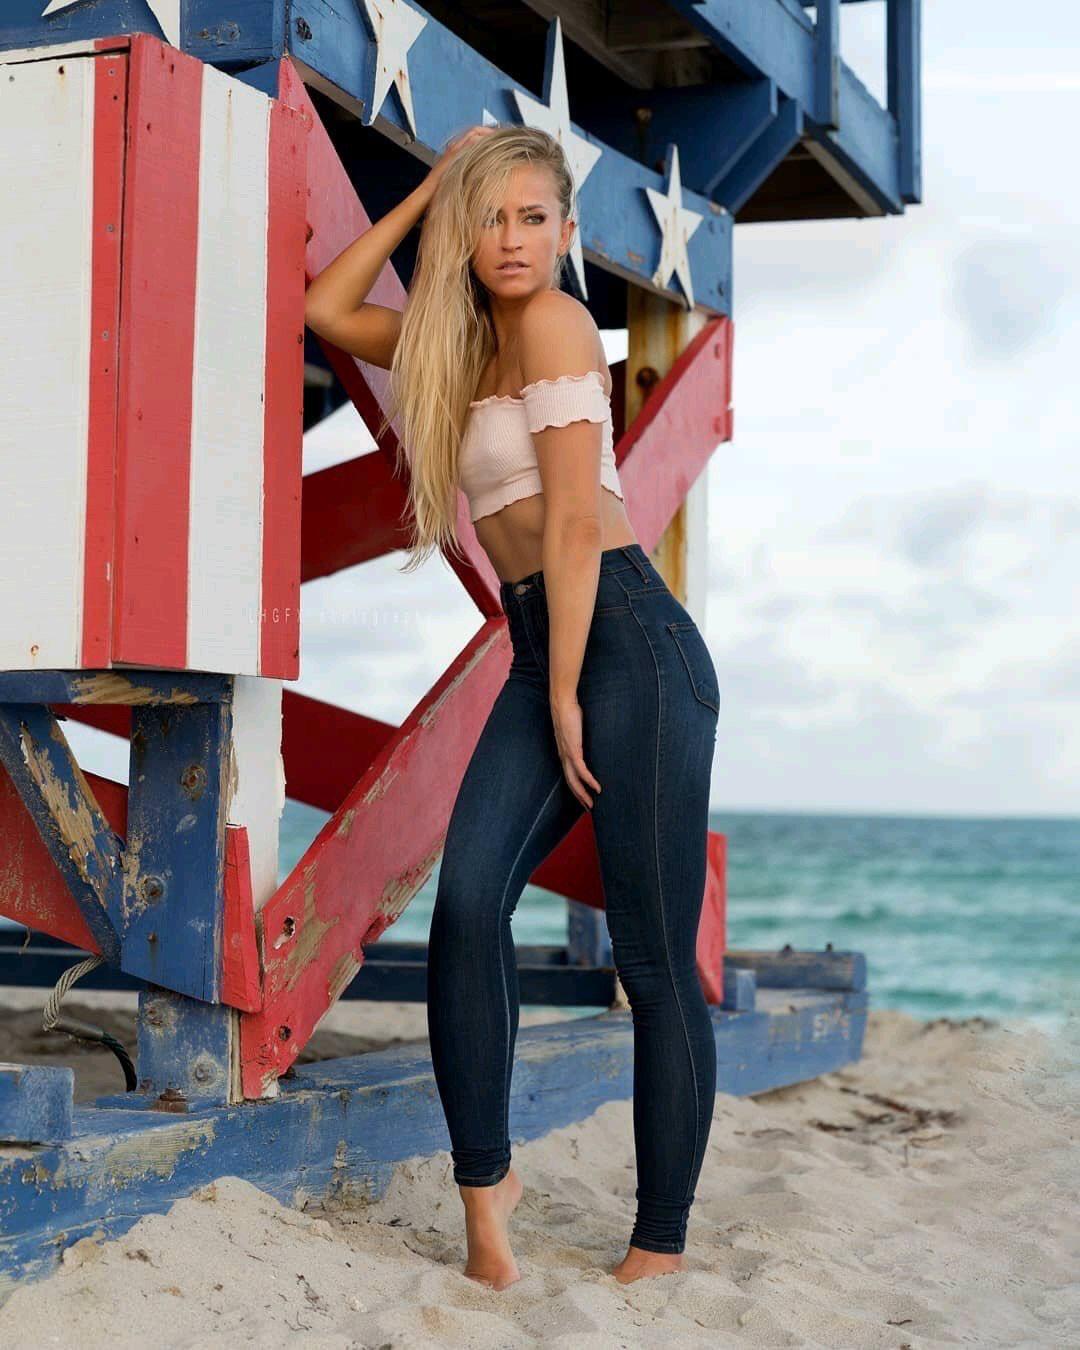 Paparazzi Ellie Goulding nude photos 2019